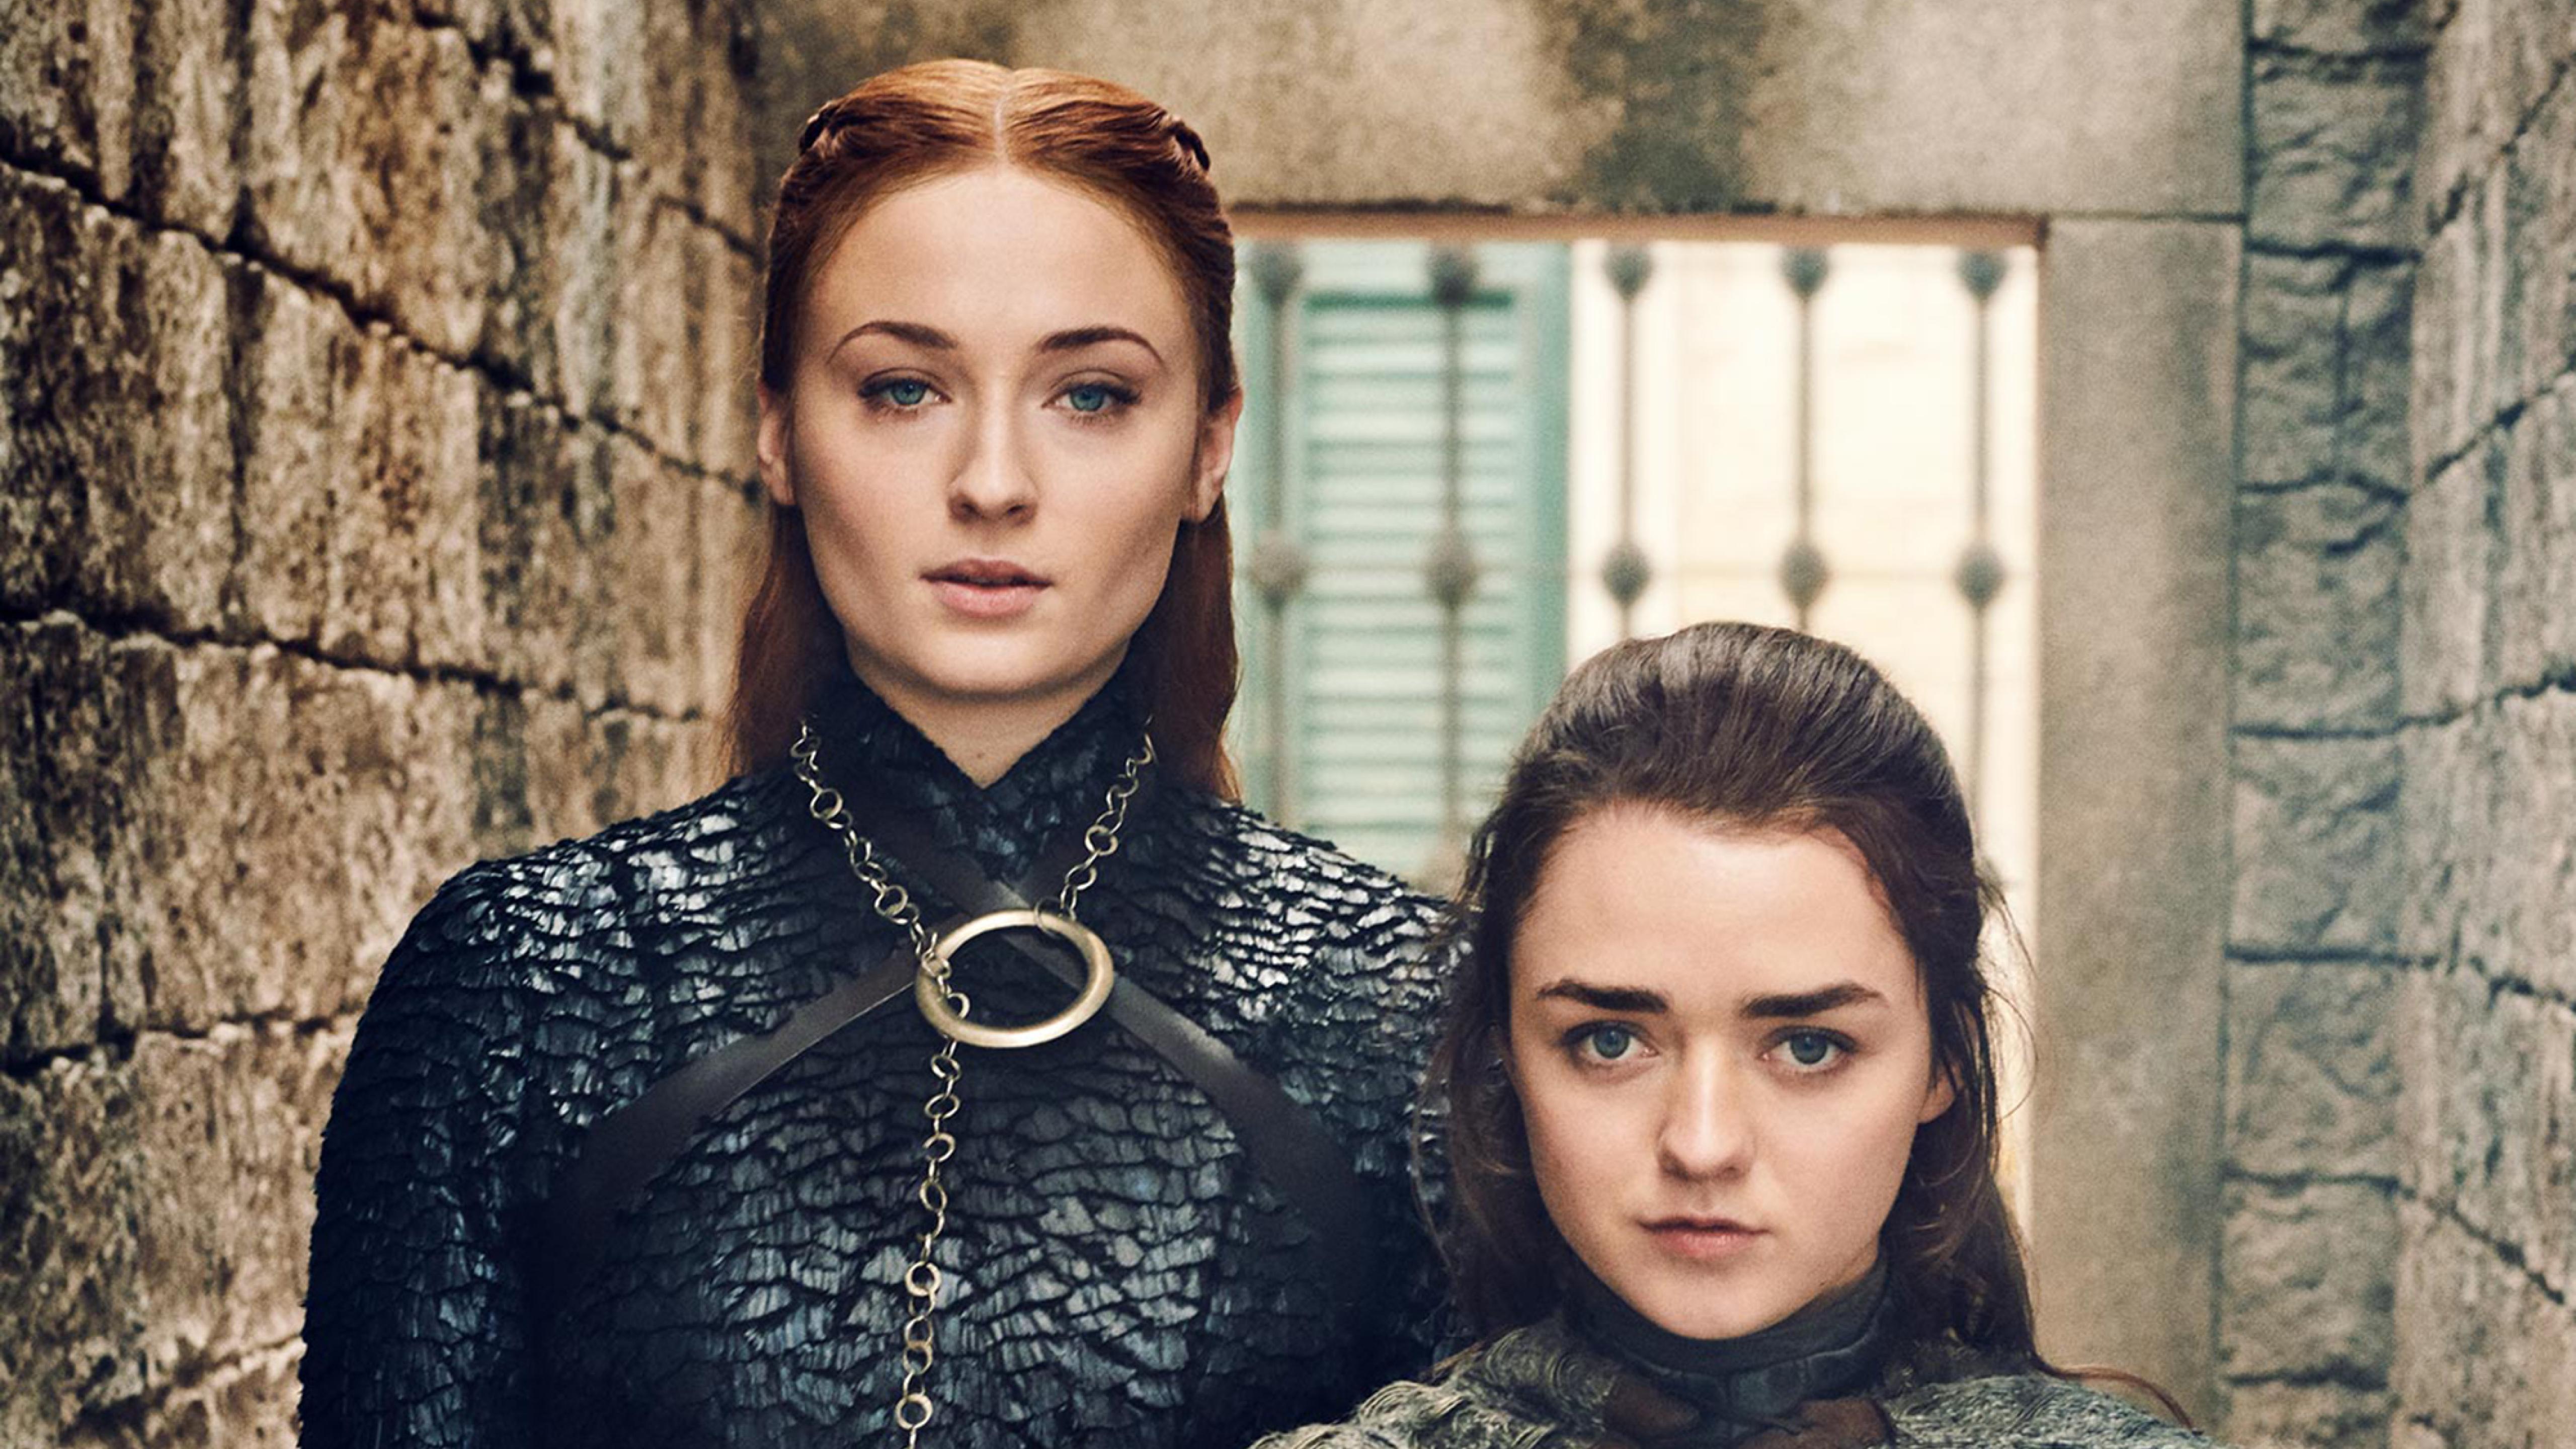 5120x2880 Sansa Stark And Arya Stark Game Of Thrones 8 5k